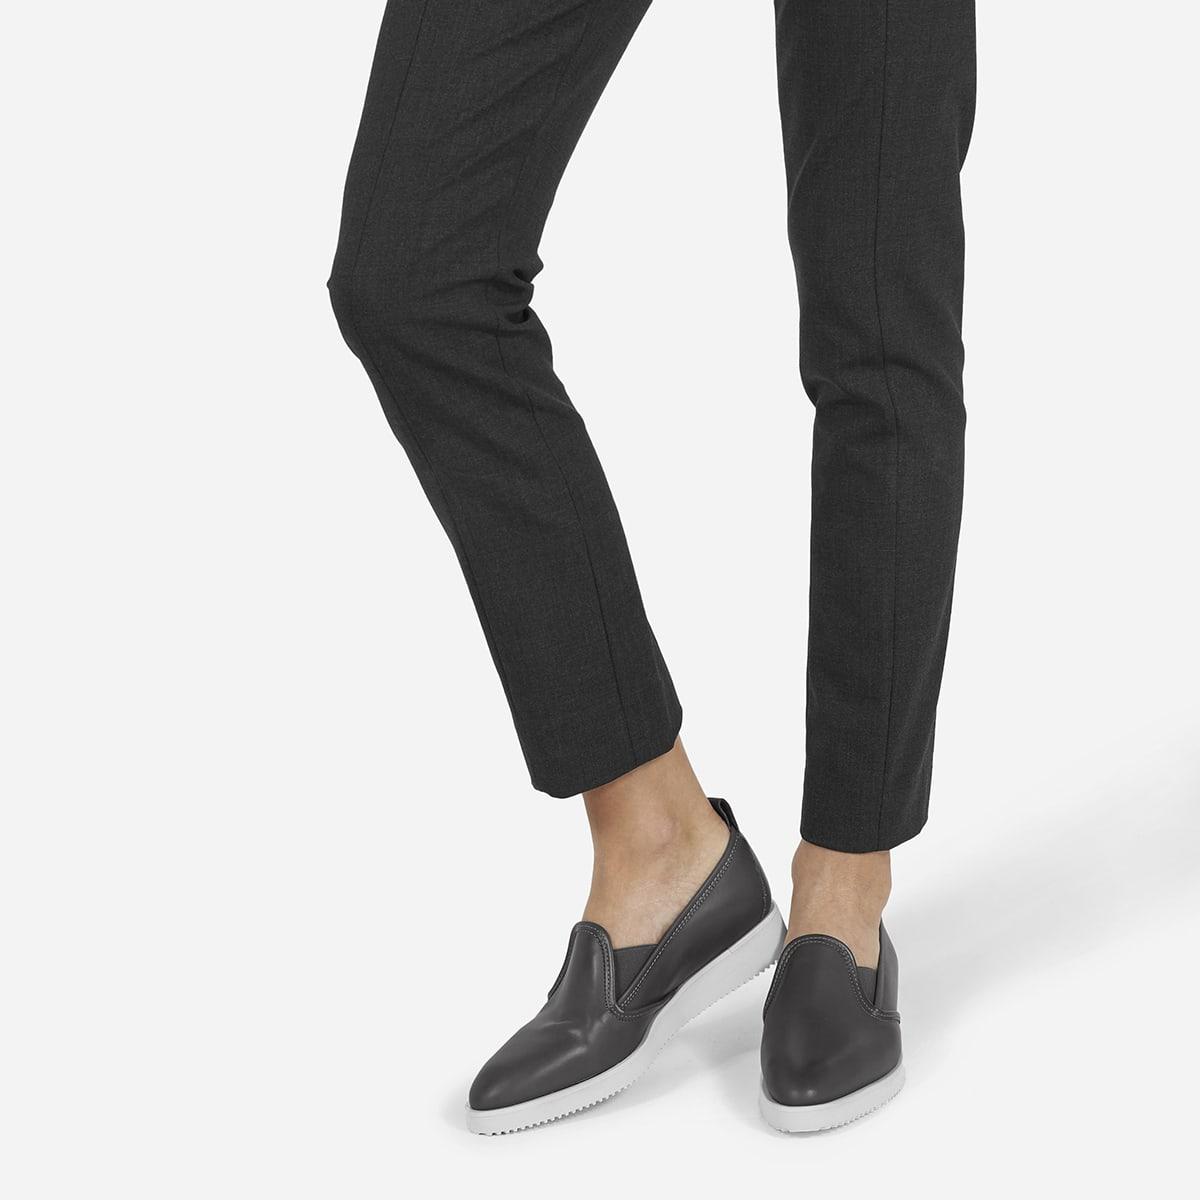 Women's Leather Street Shoe | Everlane